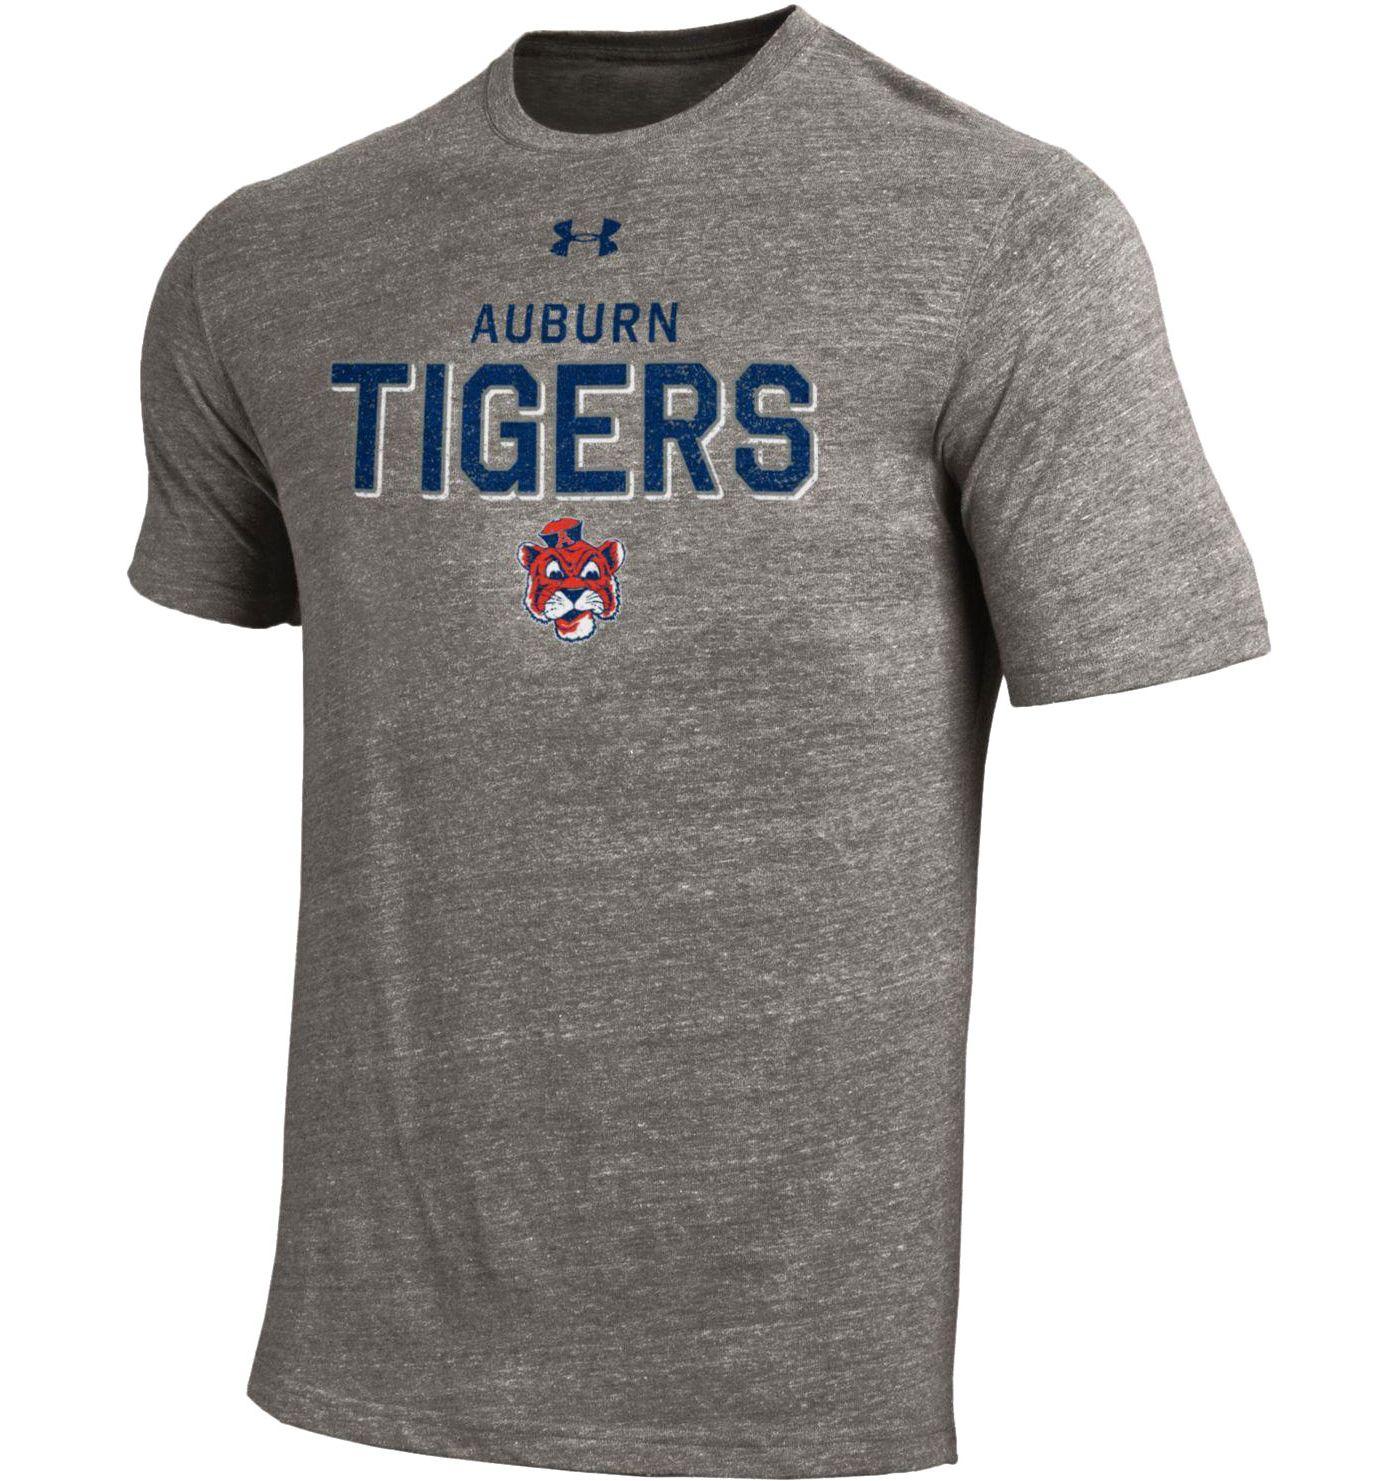 Under Armour Men's Auburn Tigers Grey Tri-Blend Short Sleeve Performance T-Shirt